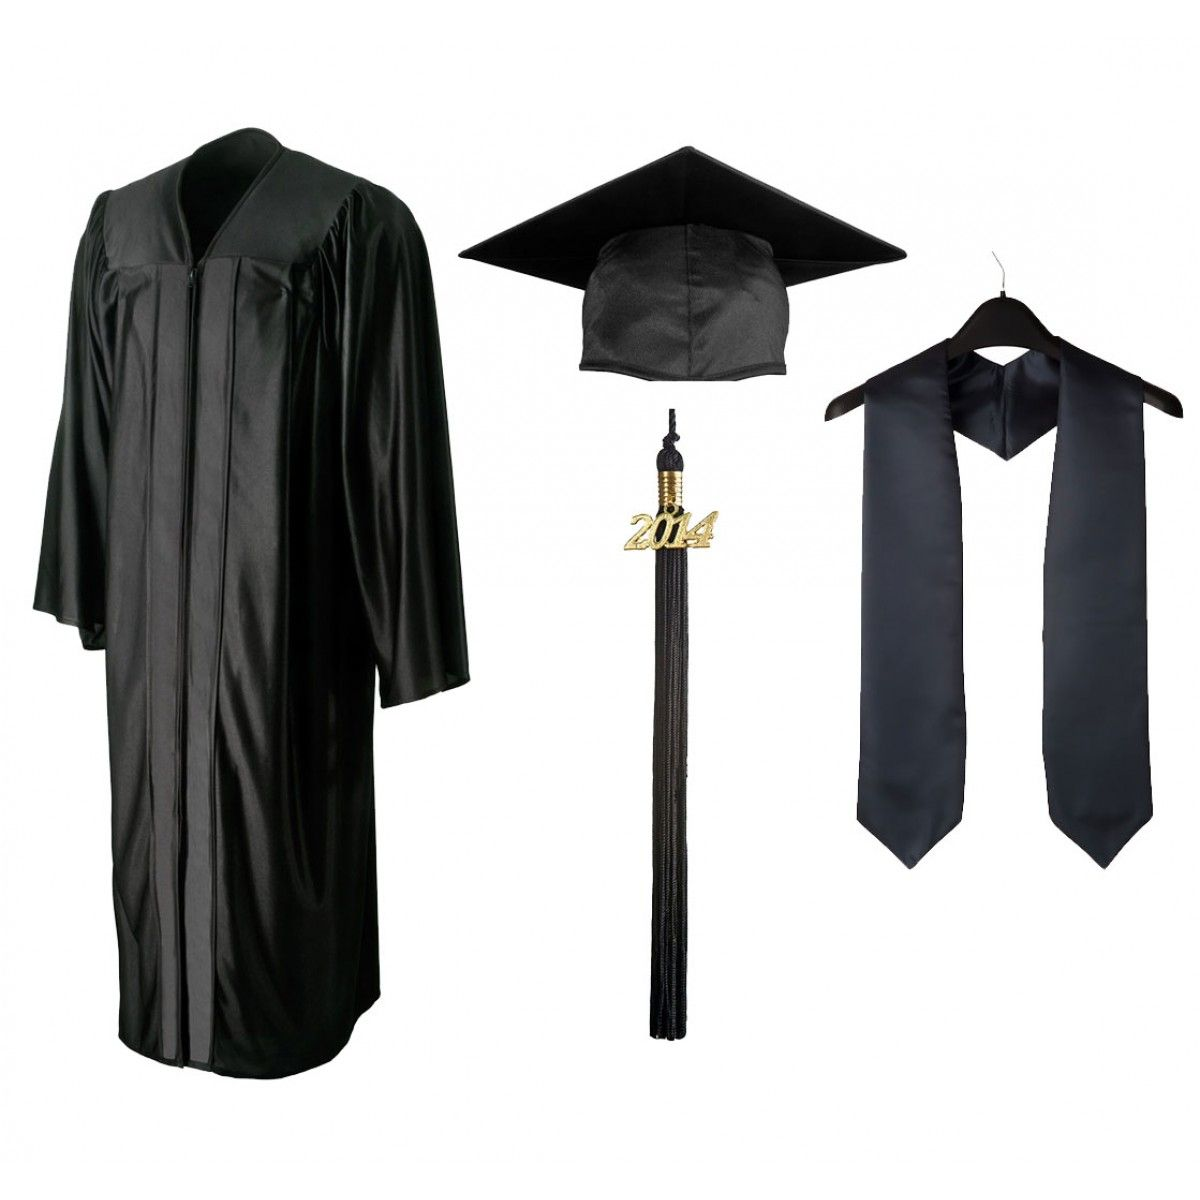 Shiny-Black-Cap-Gown-Tassel-Stole.jpeg (1200×1200) | Graduation Rob ...